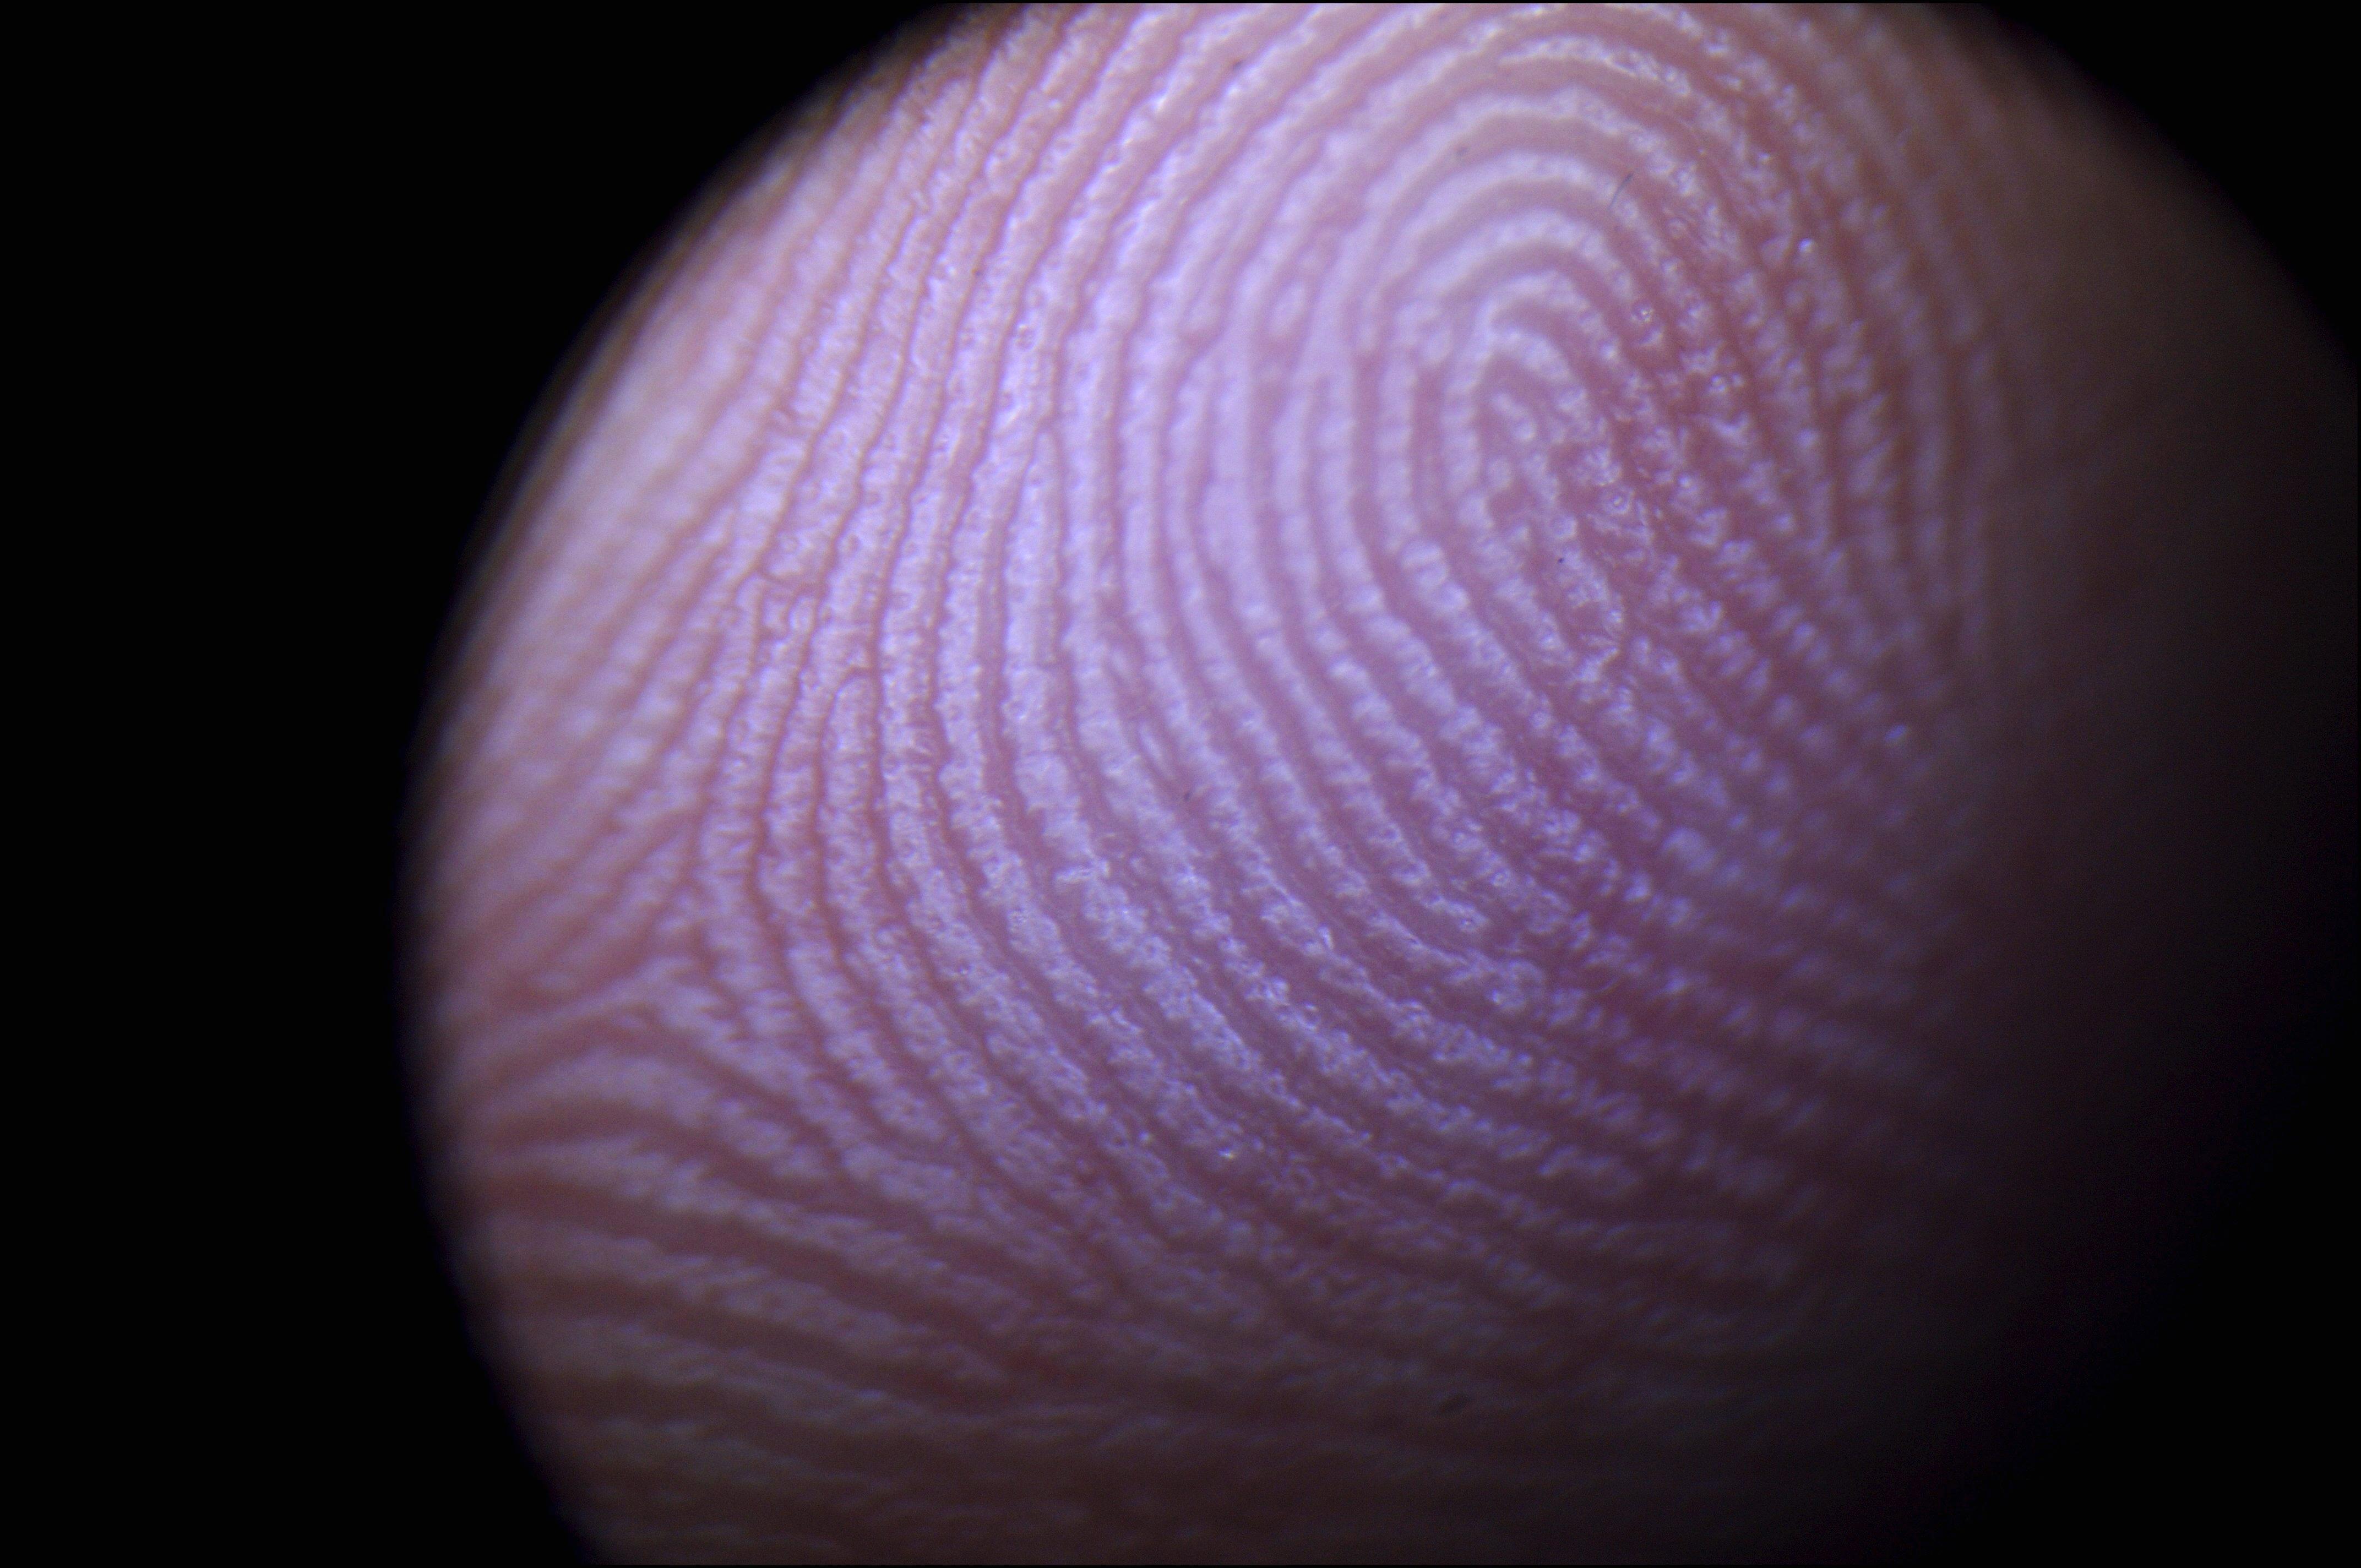 Biometrics: Body Identity. On November 29Th, 2005. In Paris, France